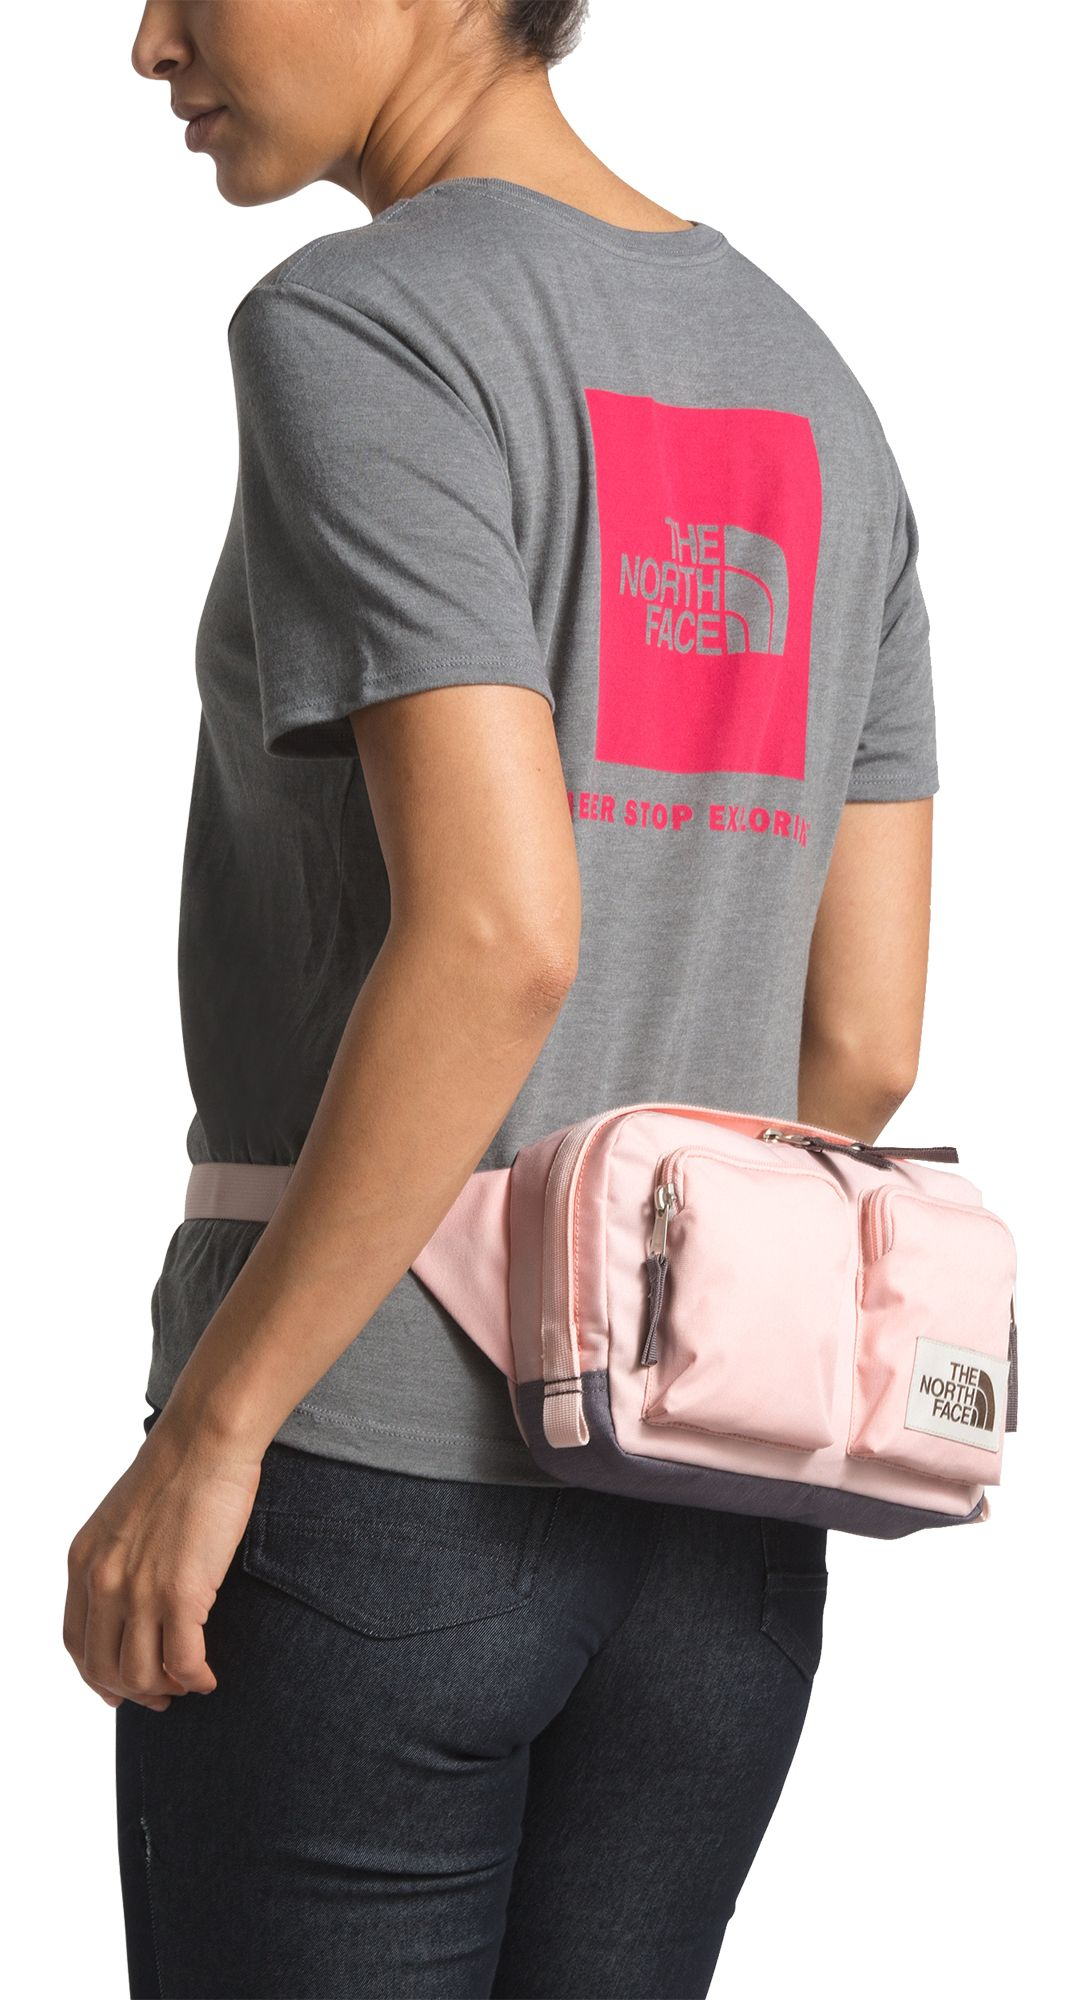 neuer & gebrauchter designer professionelles Design herren The North Face Kanga Bag